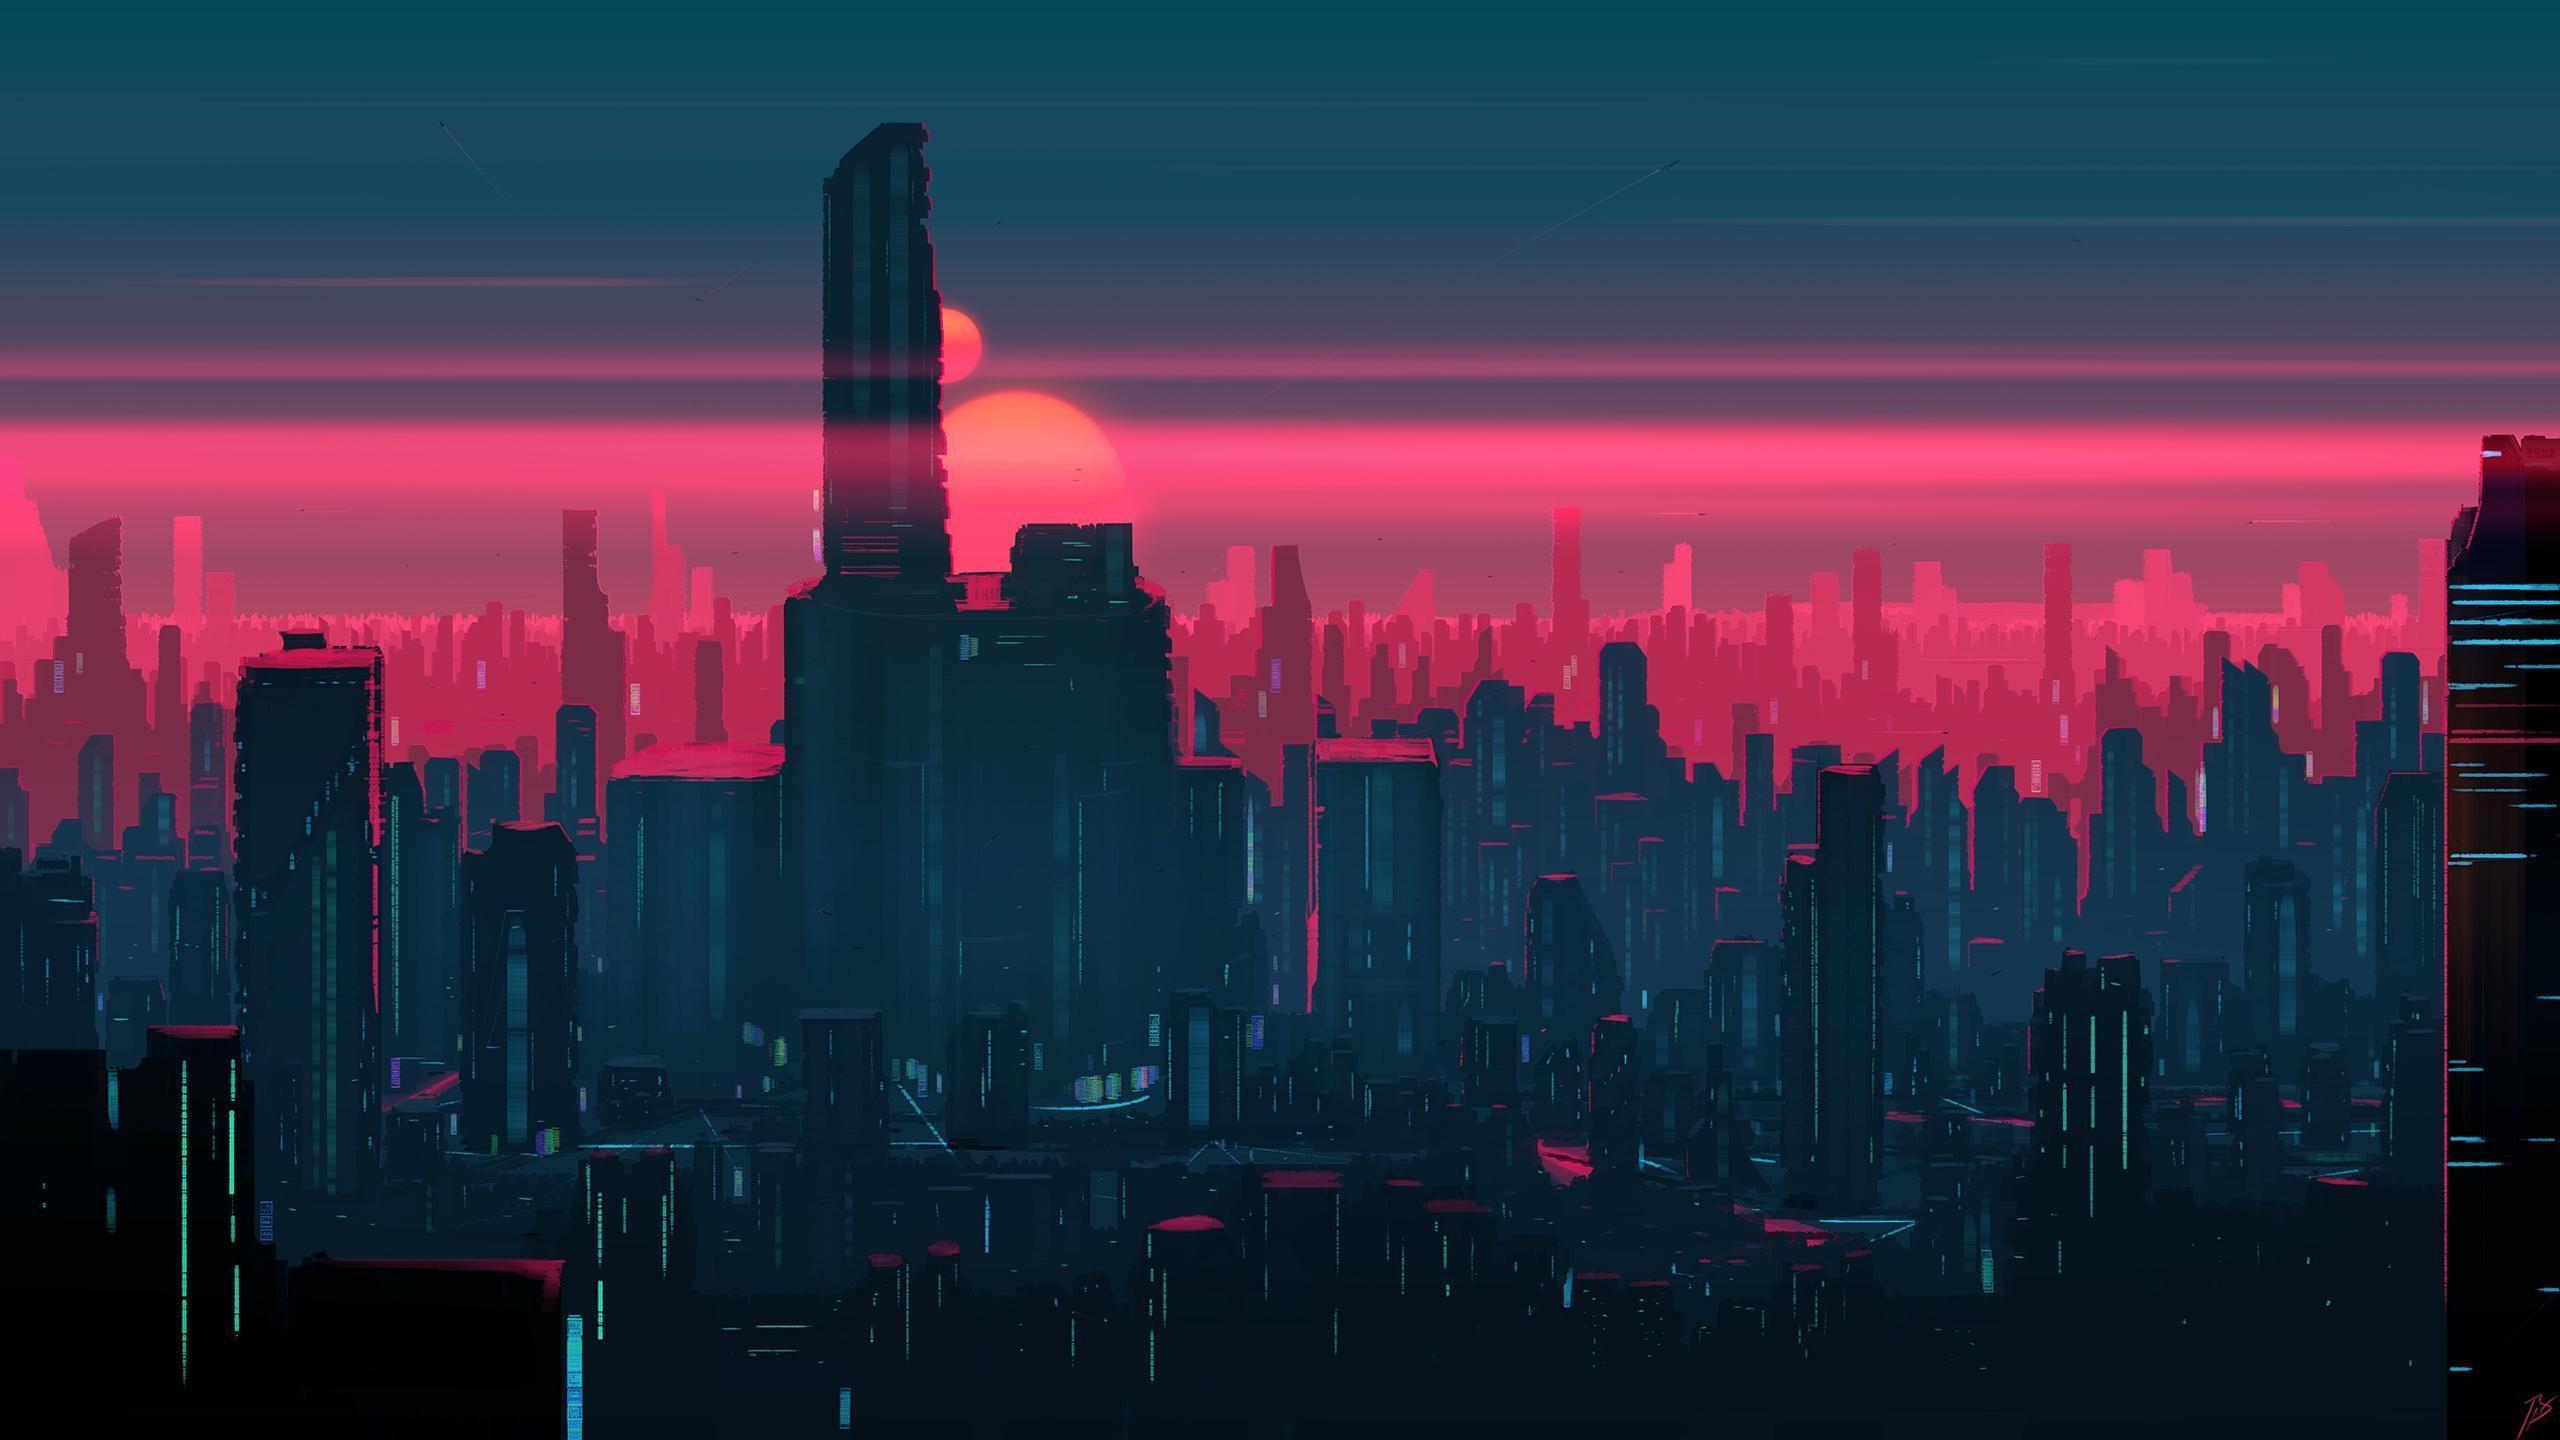 Pink Futuristic City Desktop Wallpapers Wallpaper Cave